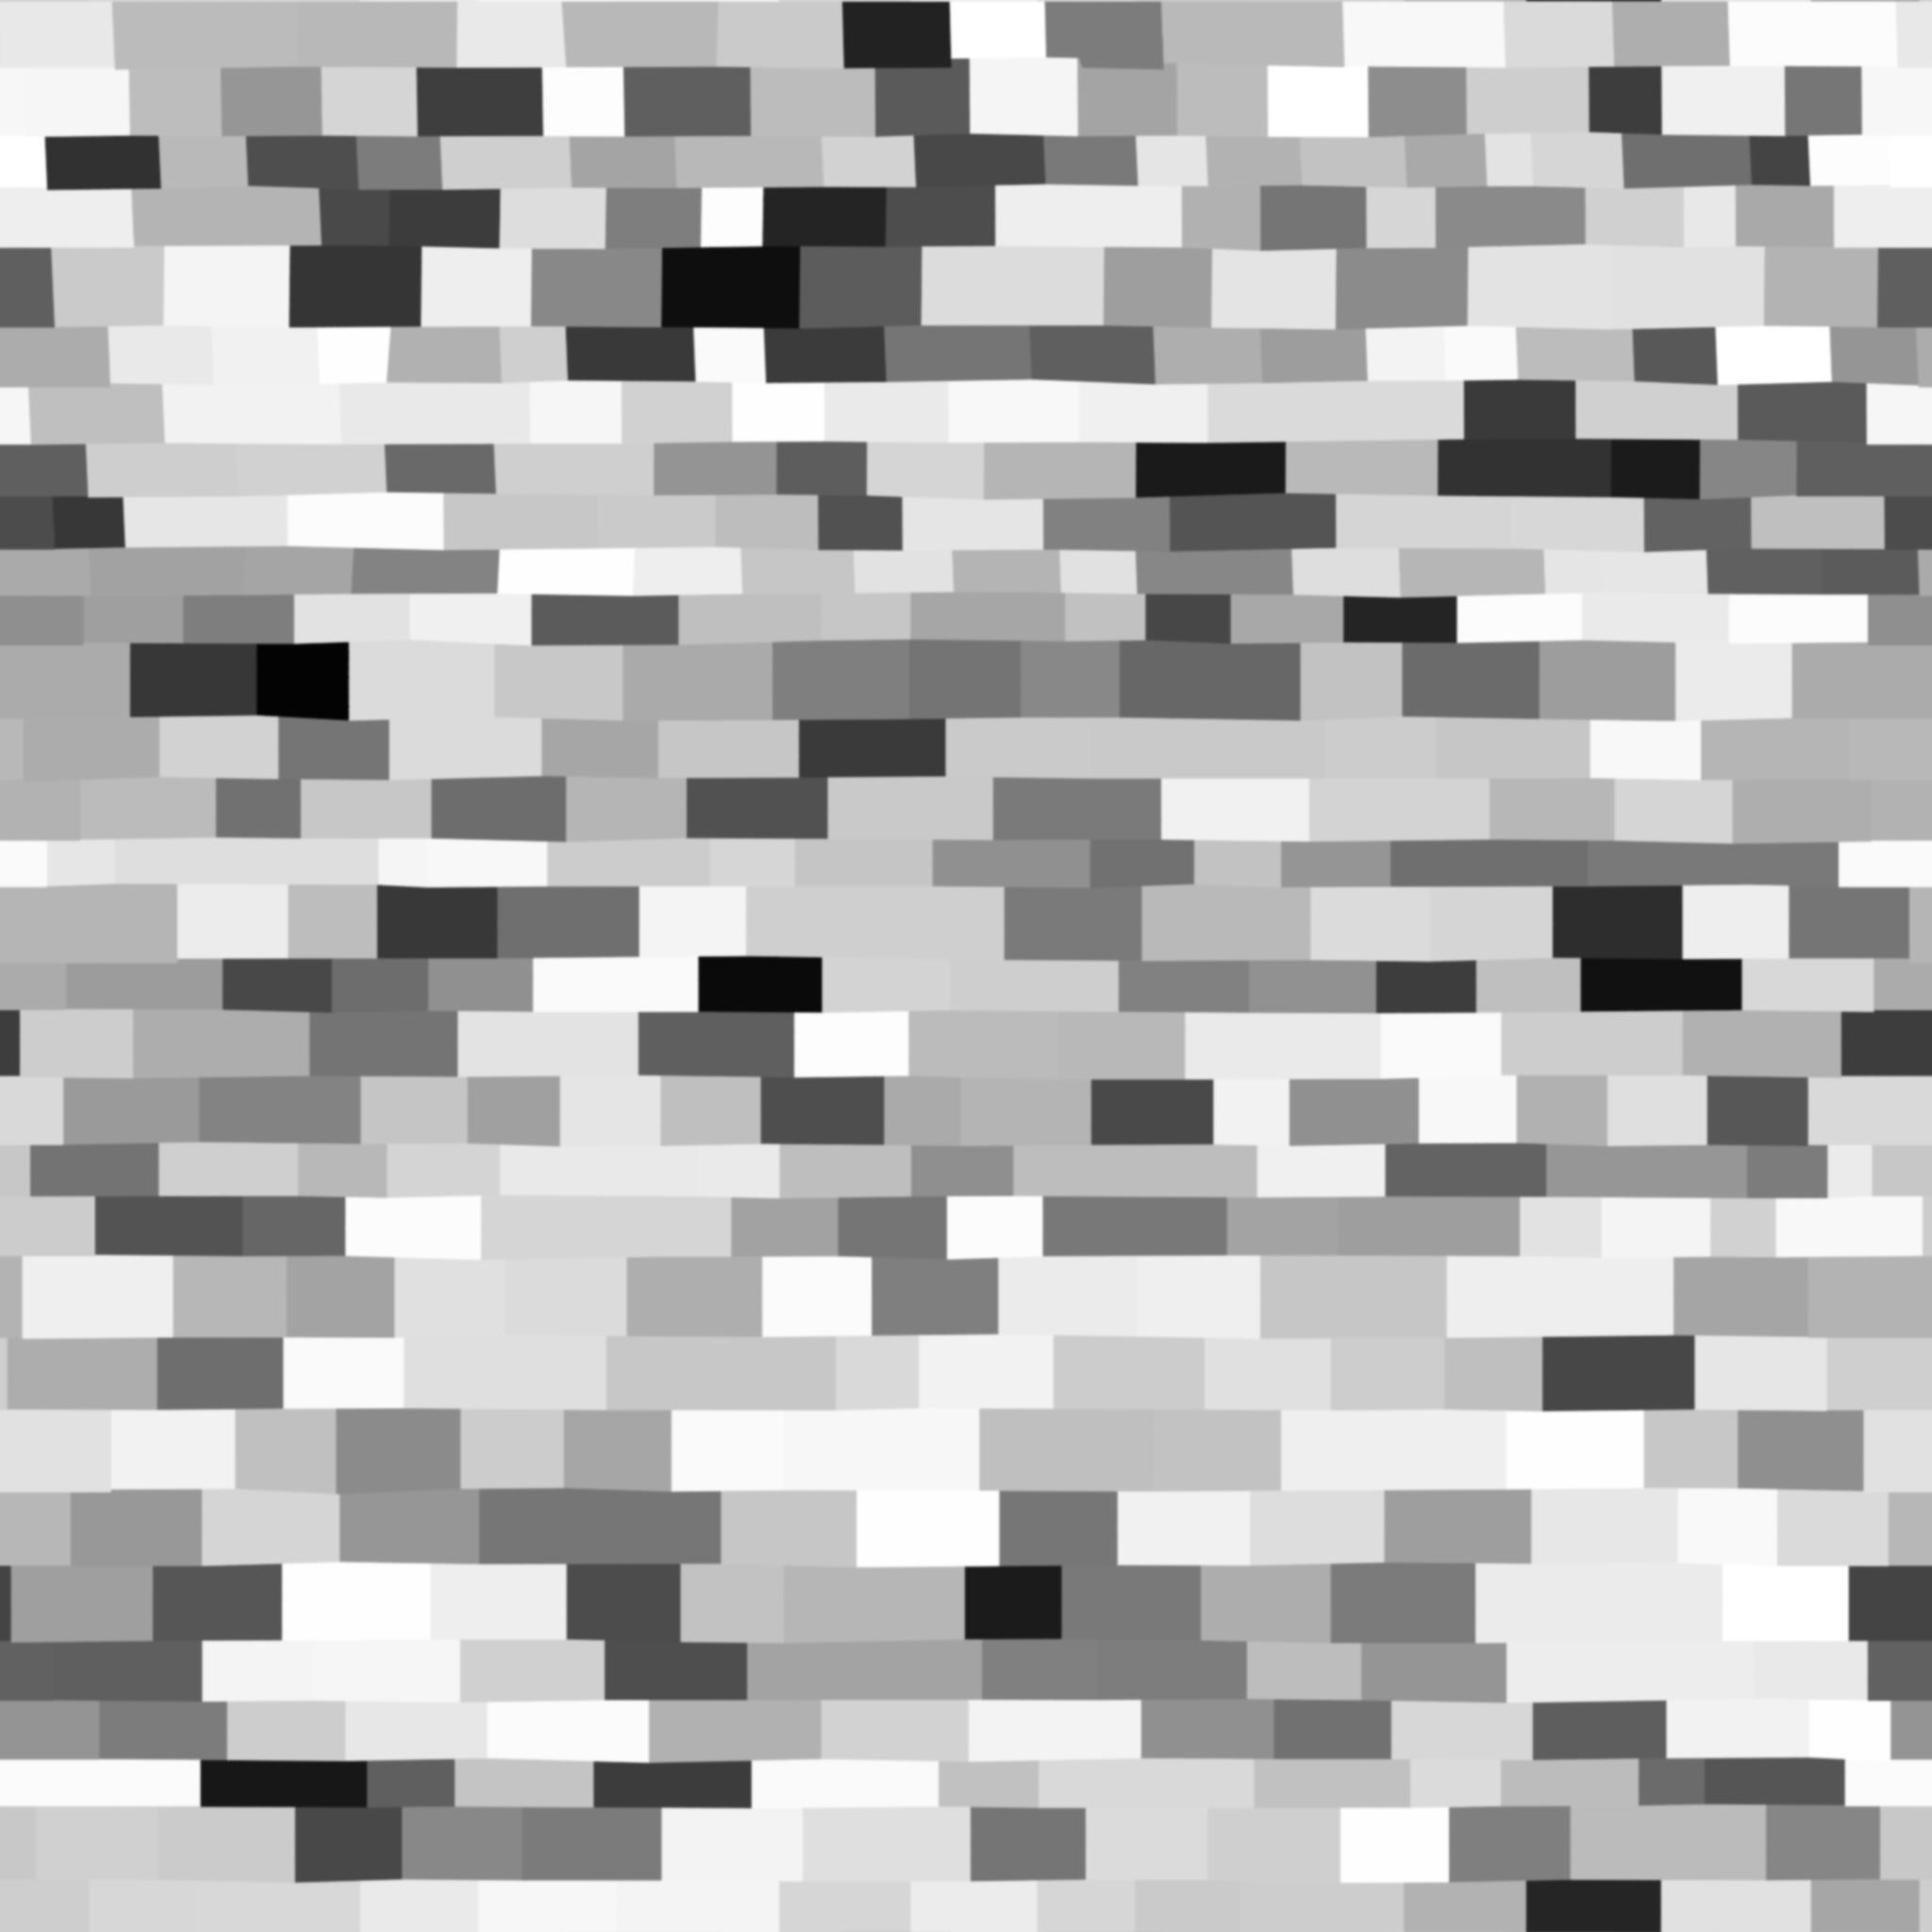 BrickOldRounded0236_1_L_disp